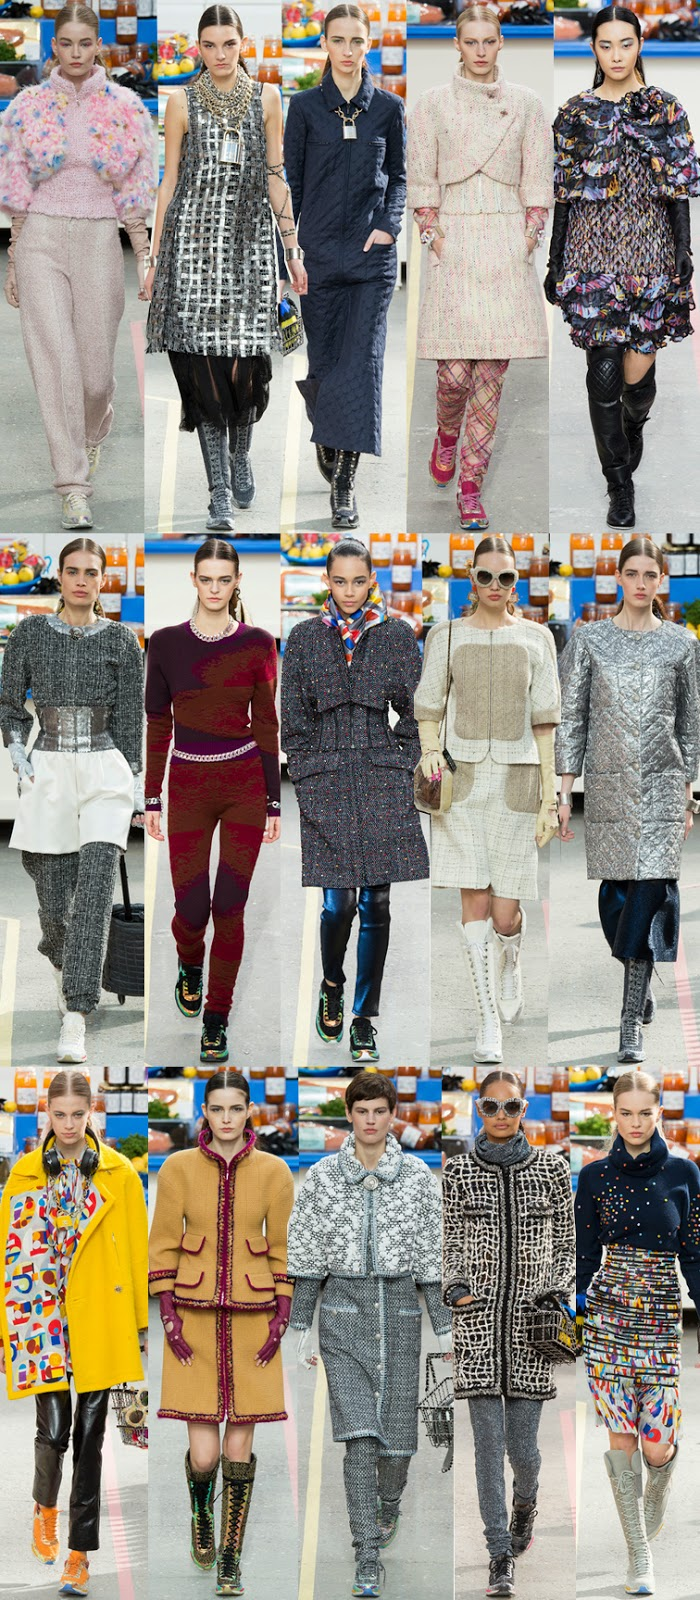 Chanel fall winter 2014 runway collection, PFW, Paris fashion week, FW14, AW14, Karl Lagerfeld